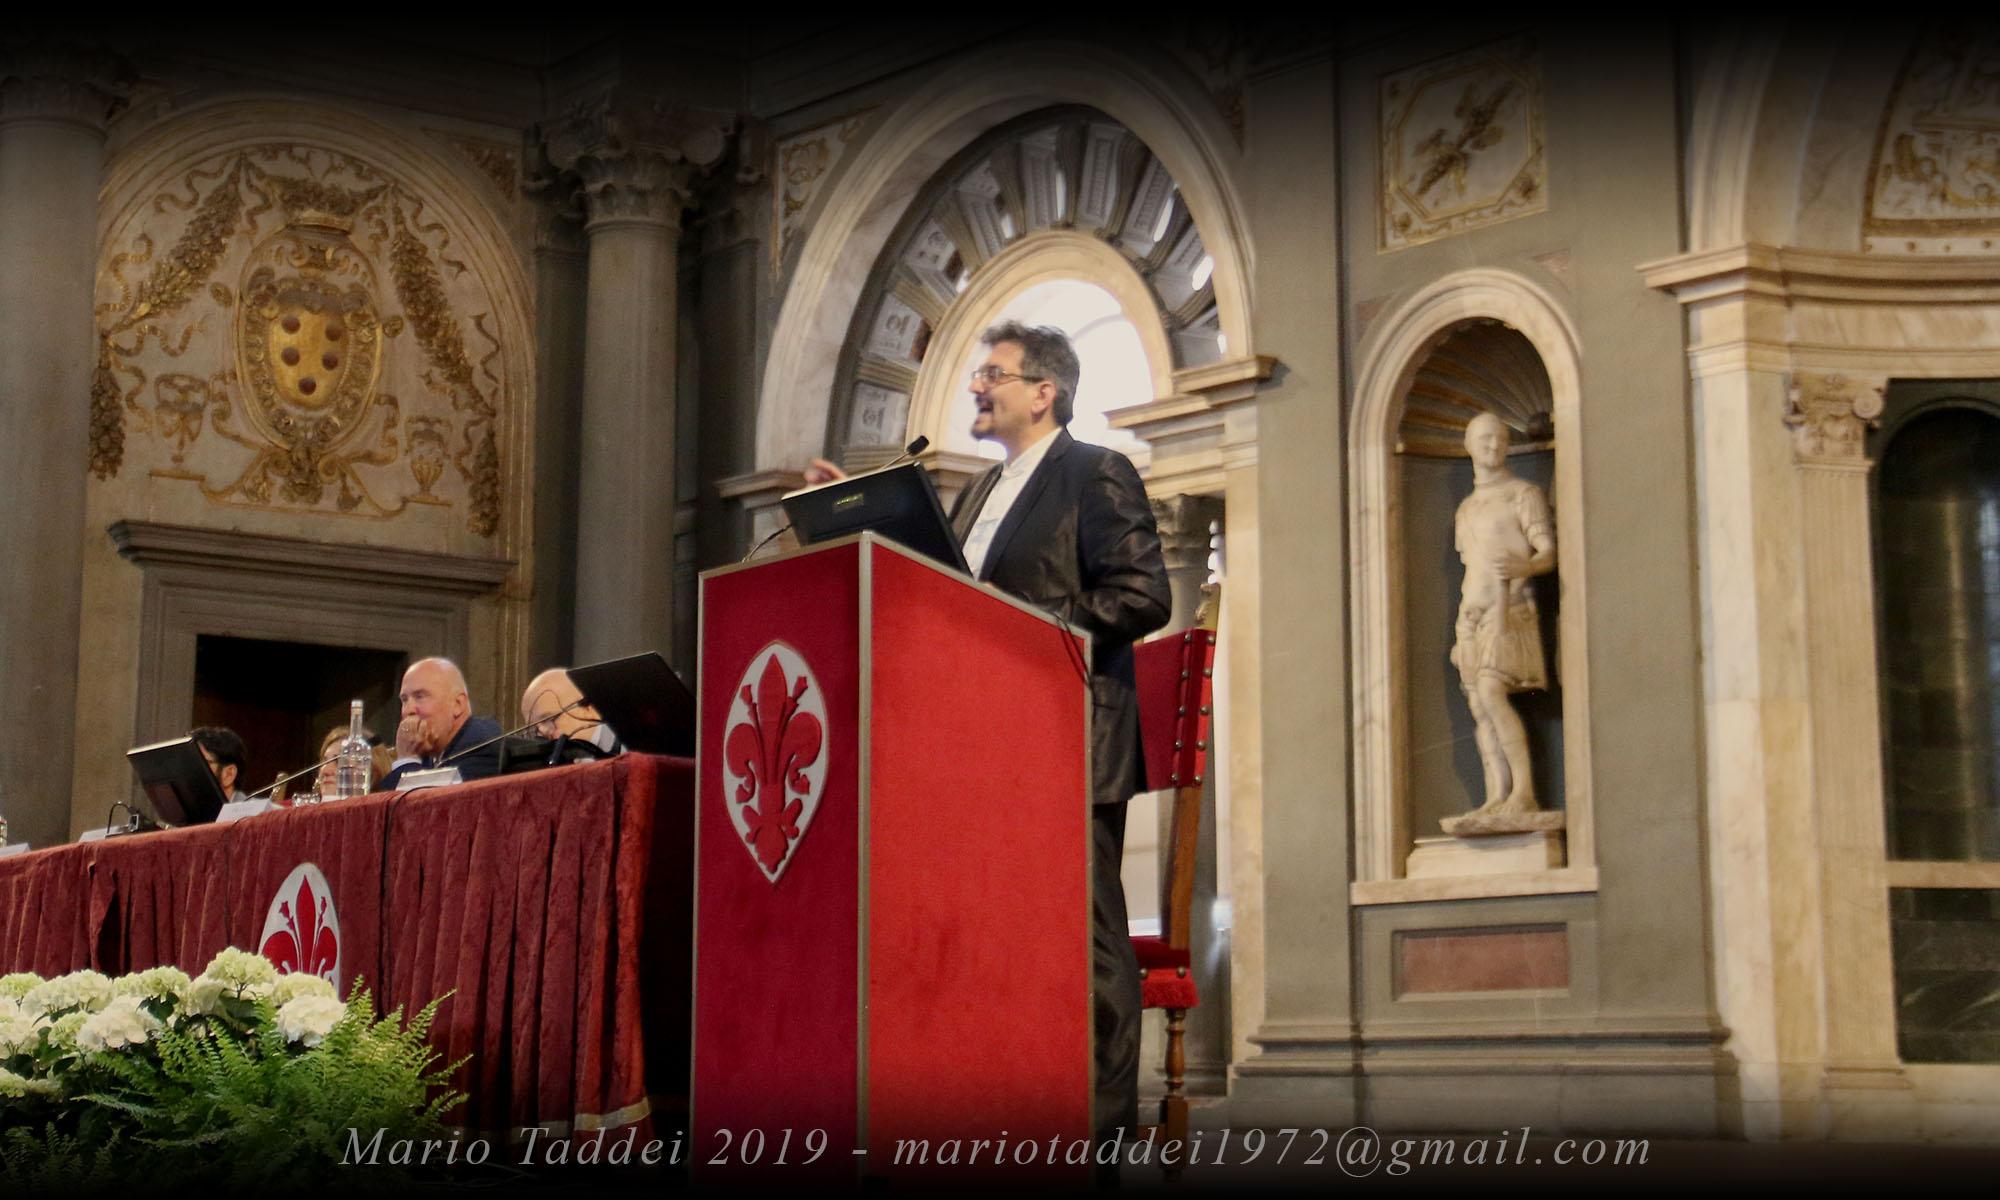 Mario Taddei